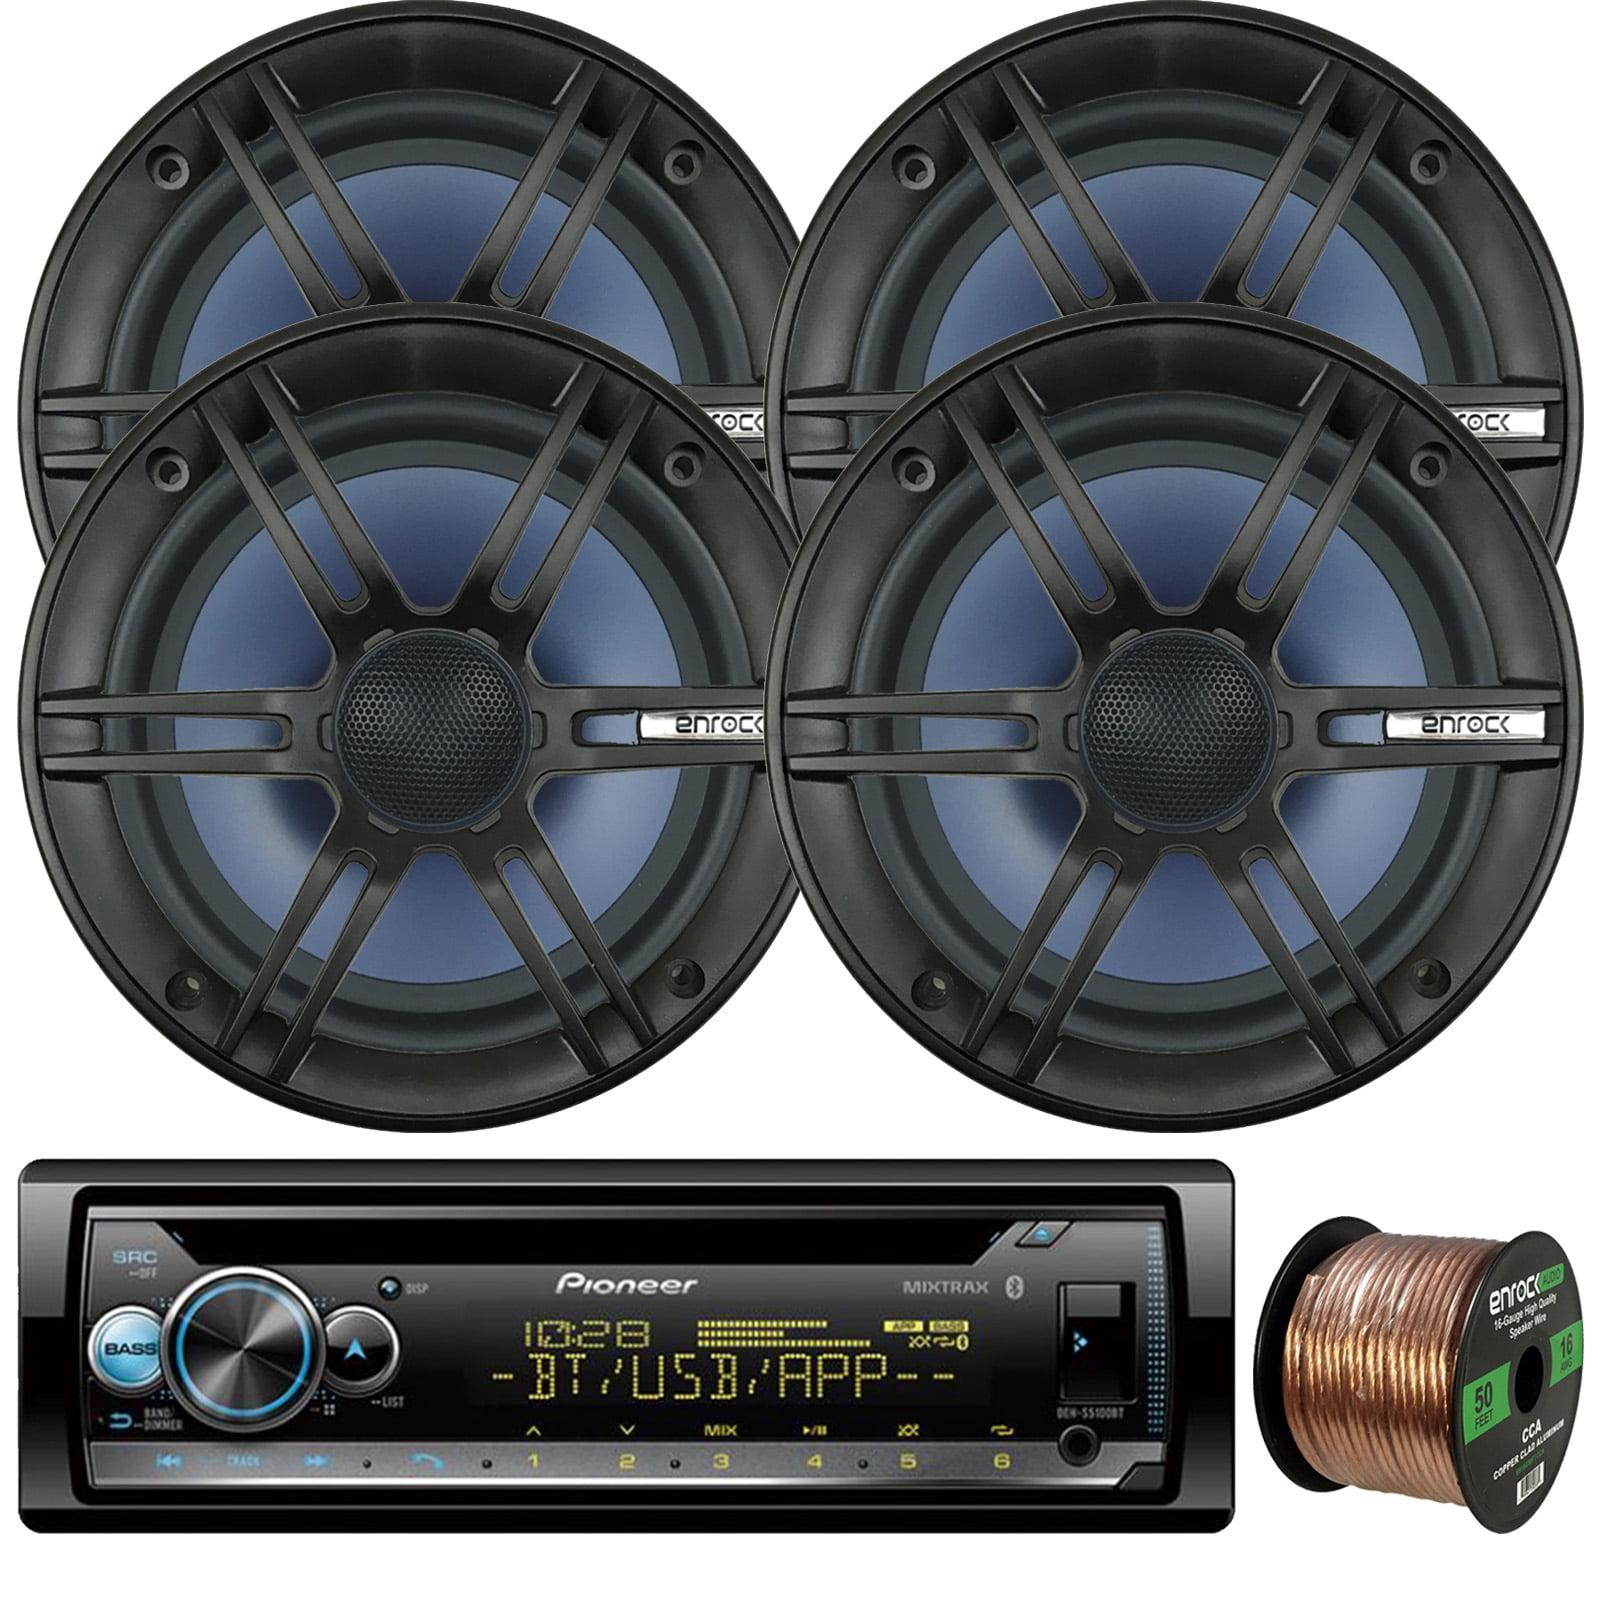 "Pioneer DEH-S5100BT In-Dash Single-DIN Built-In Bluetooth CD Receiver, 4 x Enrock Audio 6.5"" 2-Way Marine-Grade Coaxial Car/Boat Audio Stereo Speakers, 16-Gauge 50Ft. Speaker Wire"